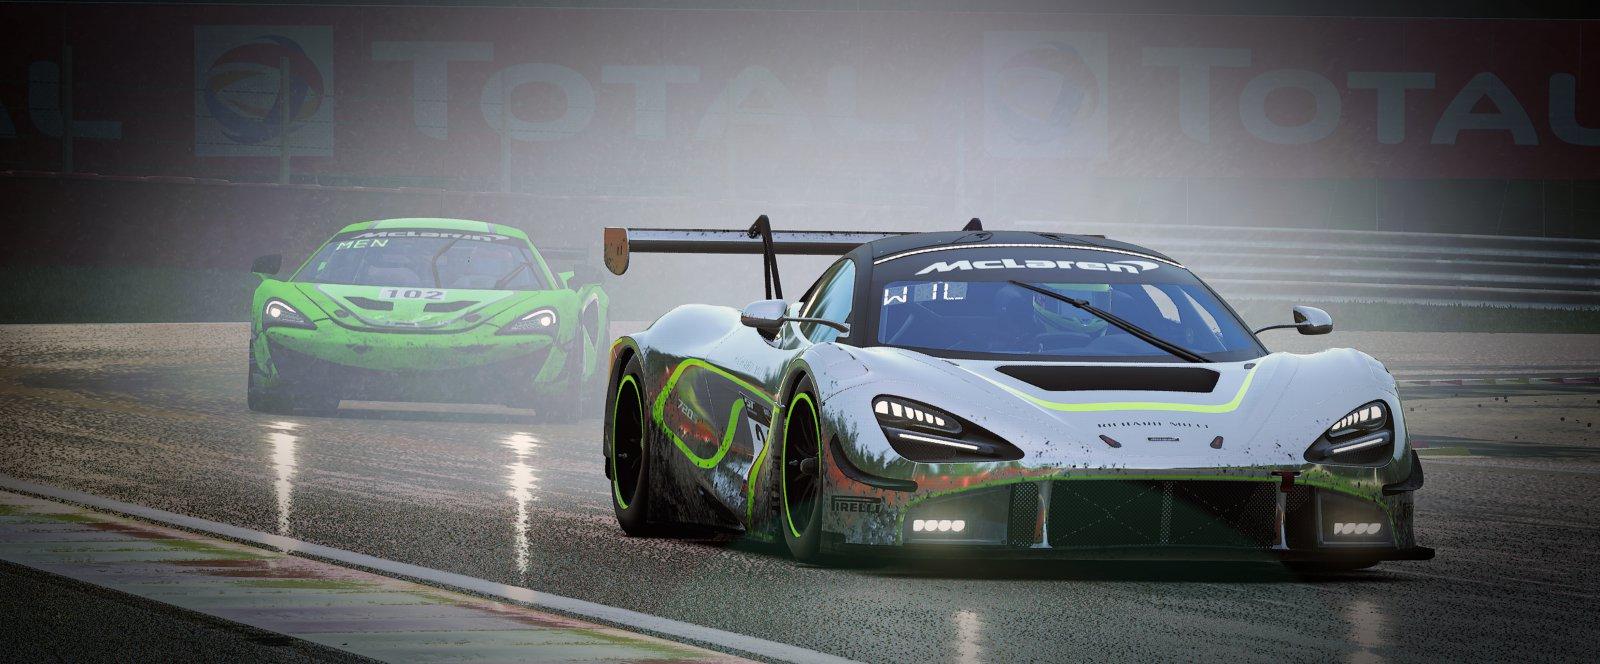 Assetto Corsa Competizione Screenshot 2020.11.14 - 20.02.48.47.jpg